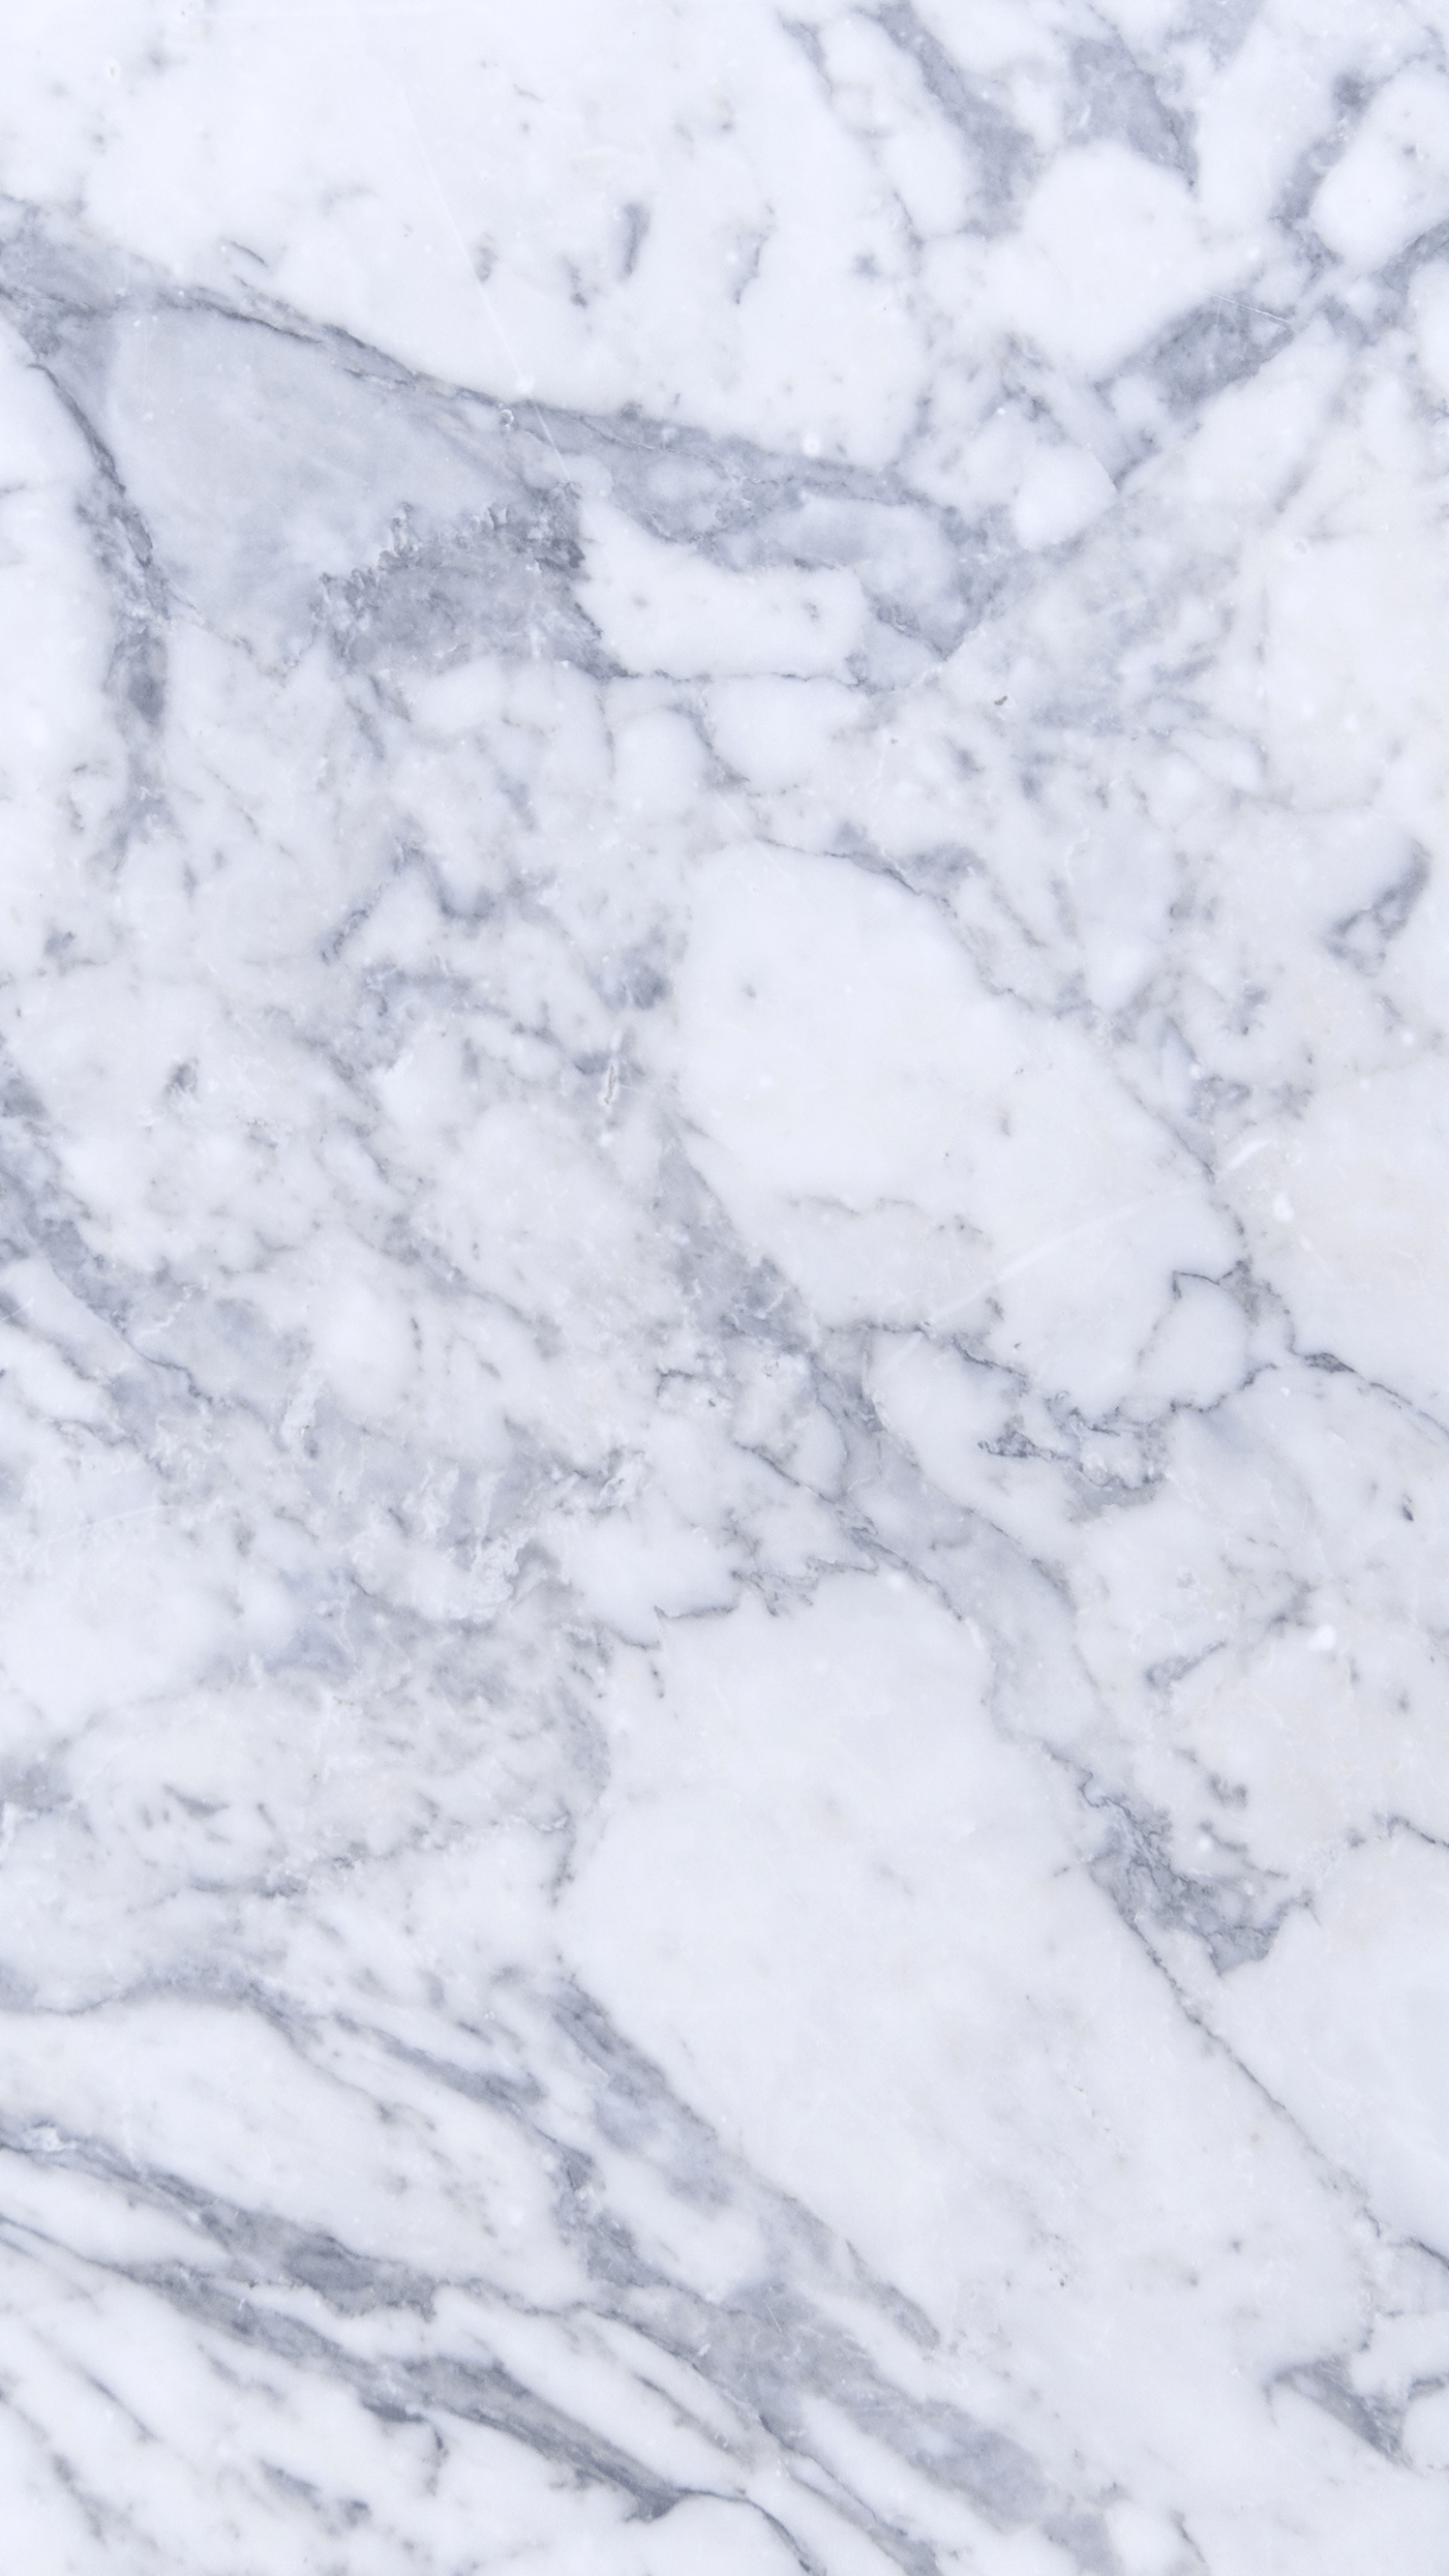 25 Tumblr Marble Desktop Wallpapers Download At Wallpaperbro Marble Background Iphone Marble Background Marble Desktop Wallpaper